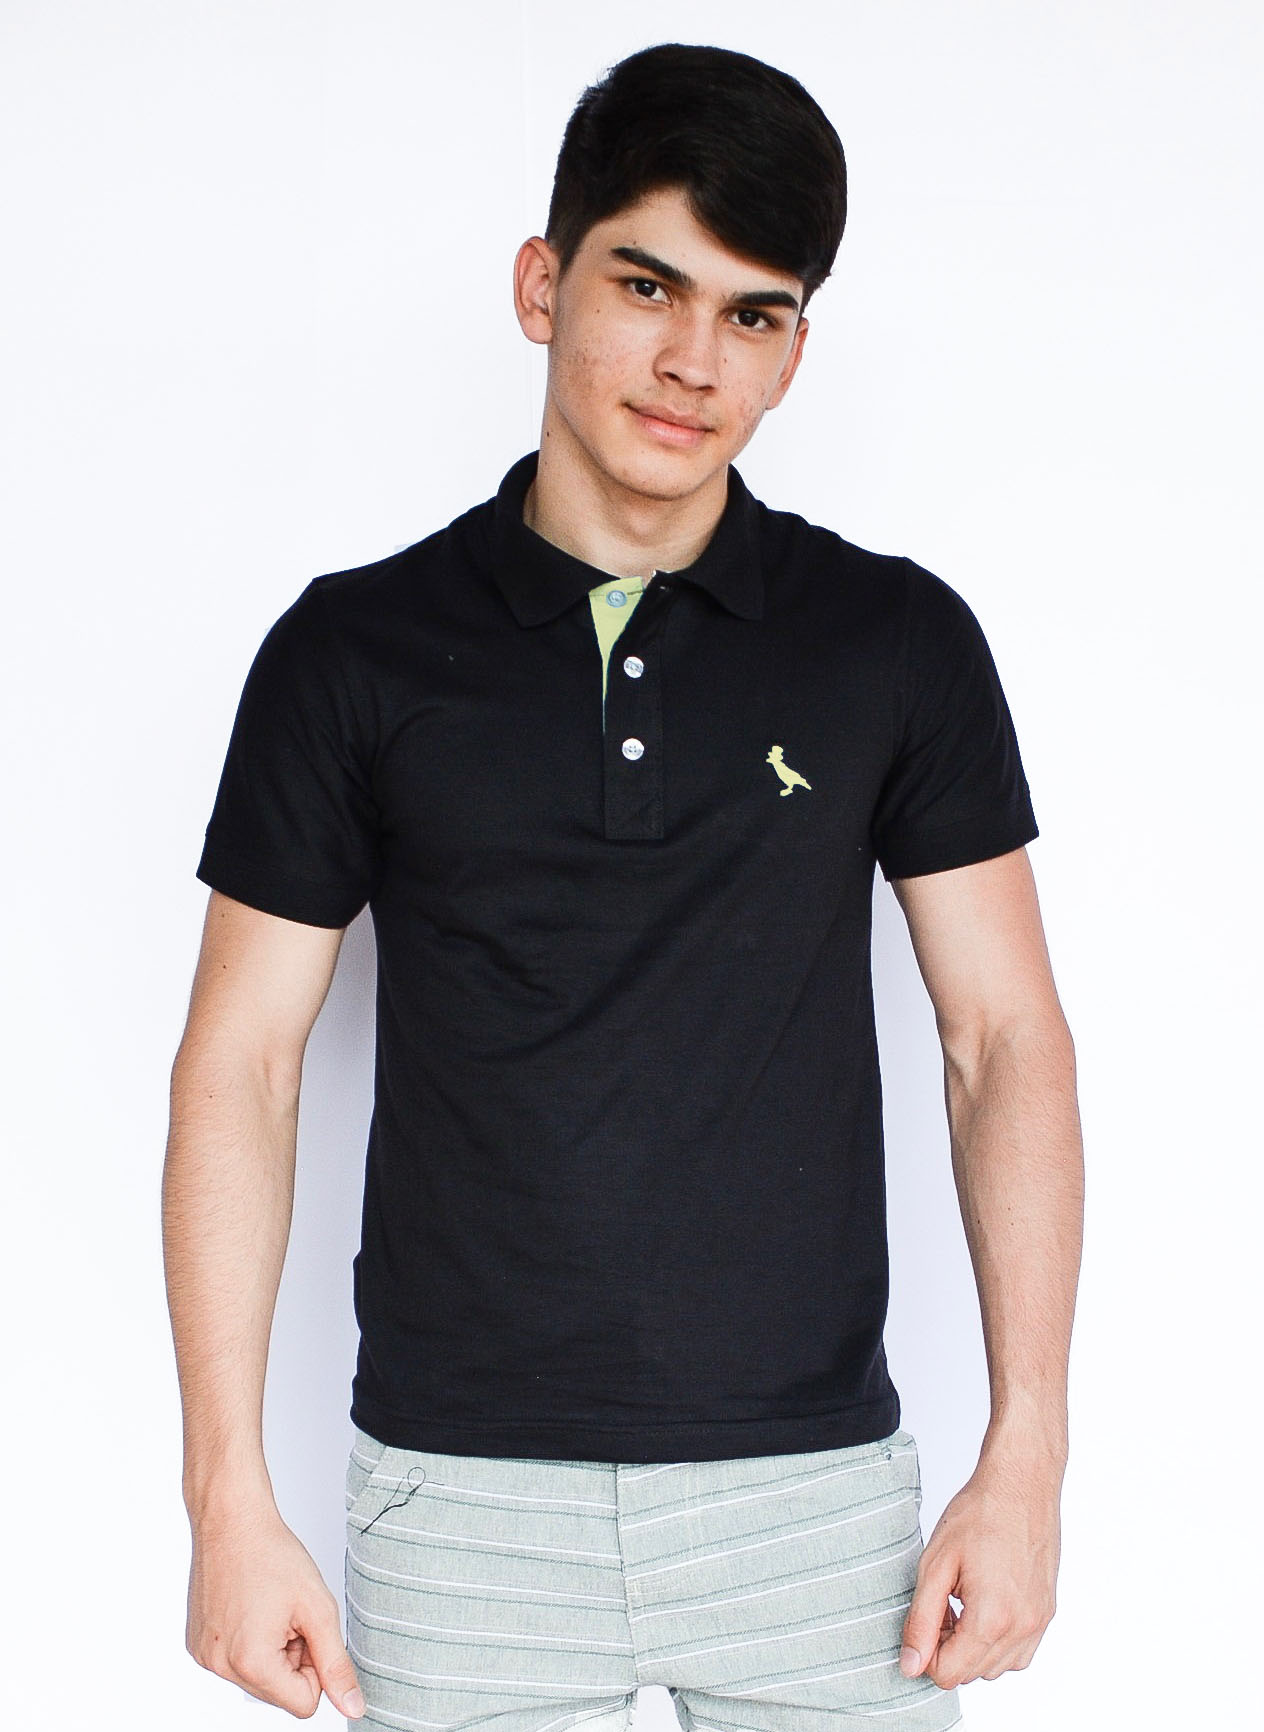 Camisa Polo Básica Preto  - Kactoos